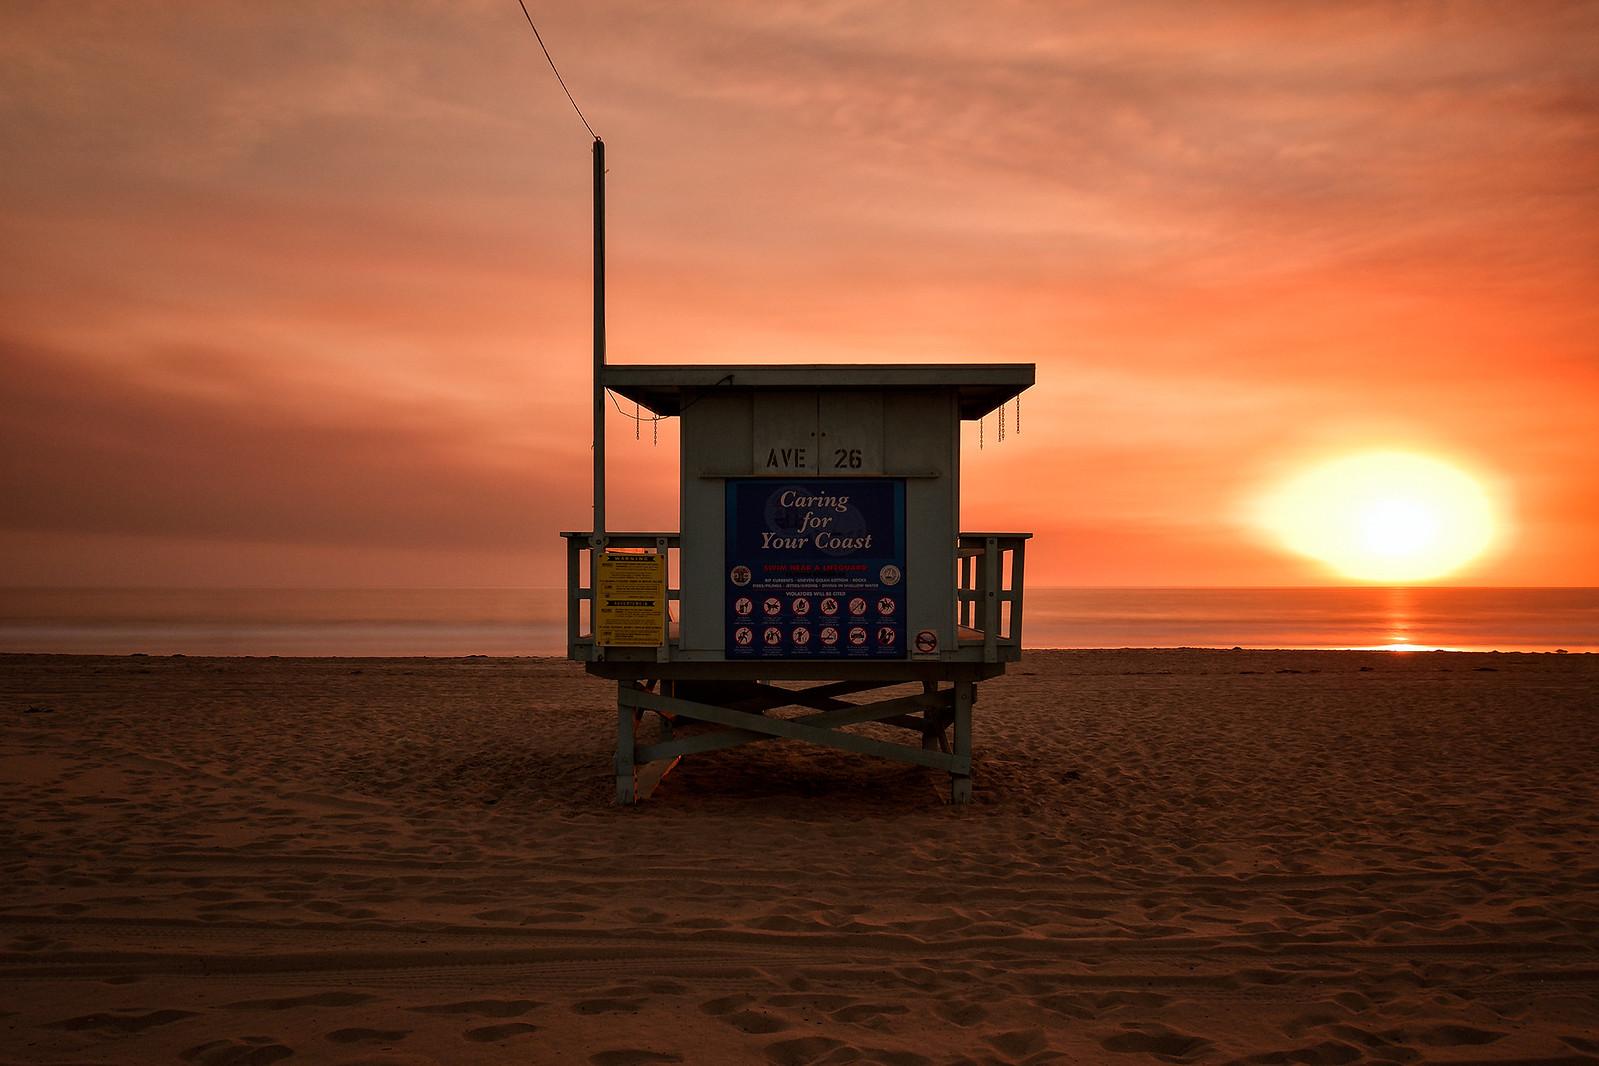 ave 26. venice beach, ca. 2017. | by eyetwist